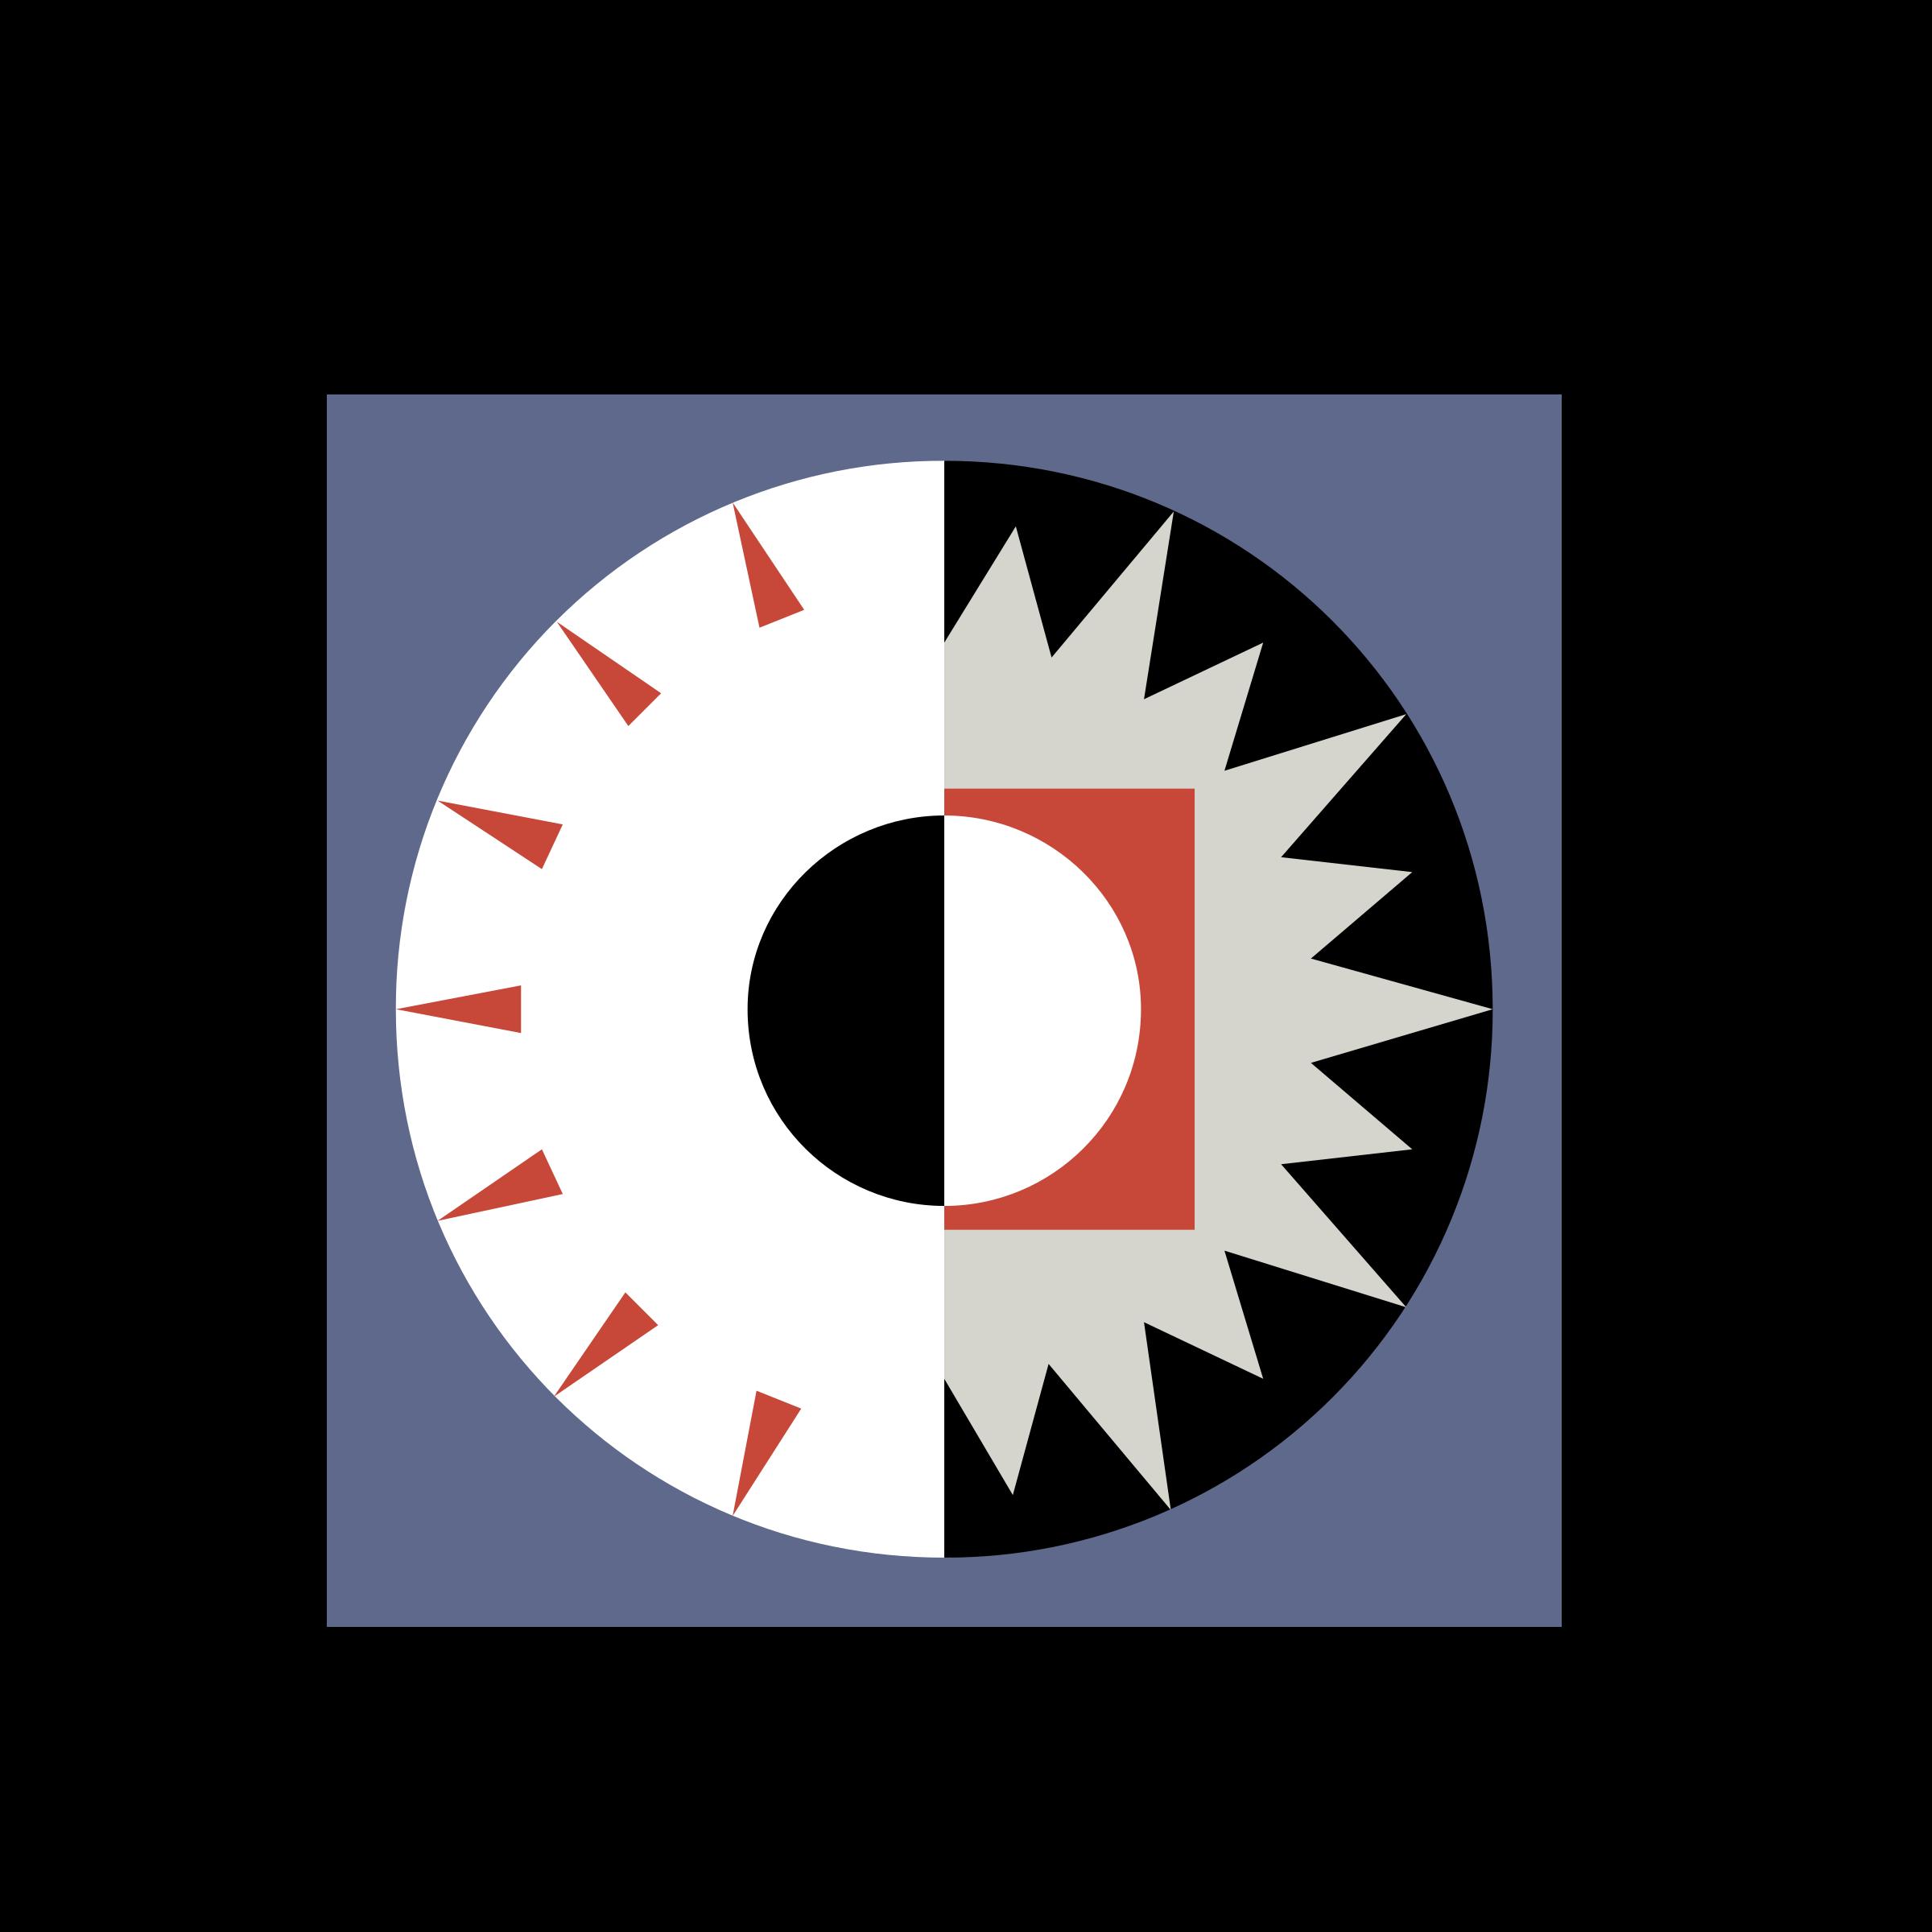 Solaris Compatible Logo PNG Transparent & SVG Vector.